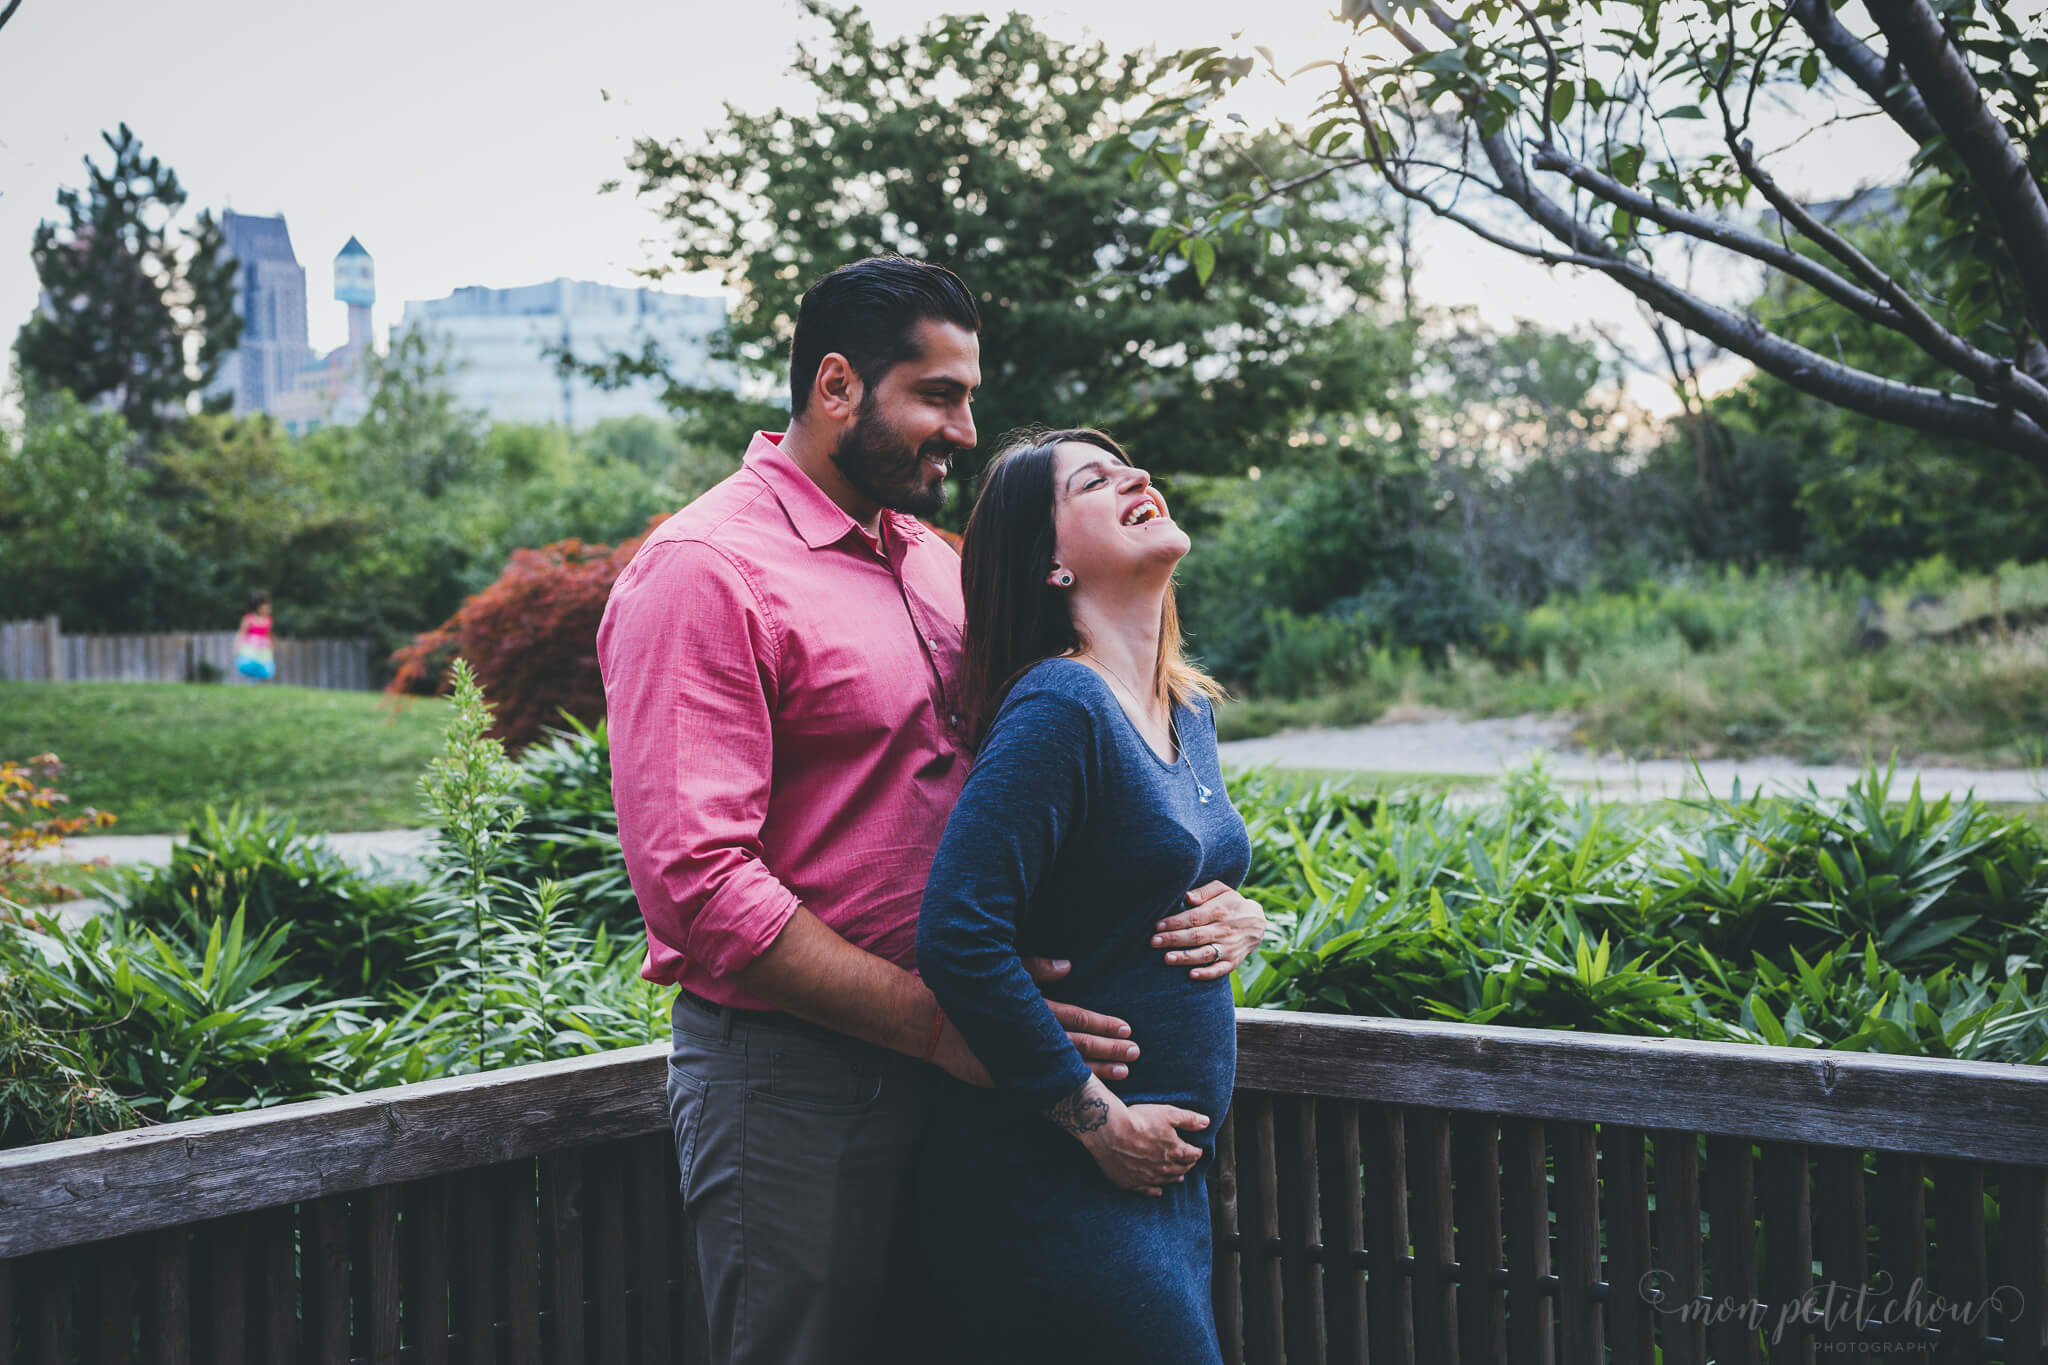 Husband and wife hugging and laughing during maternity shoot at Kariya Park in Toronto